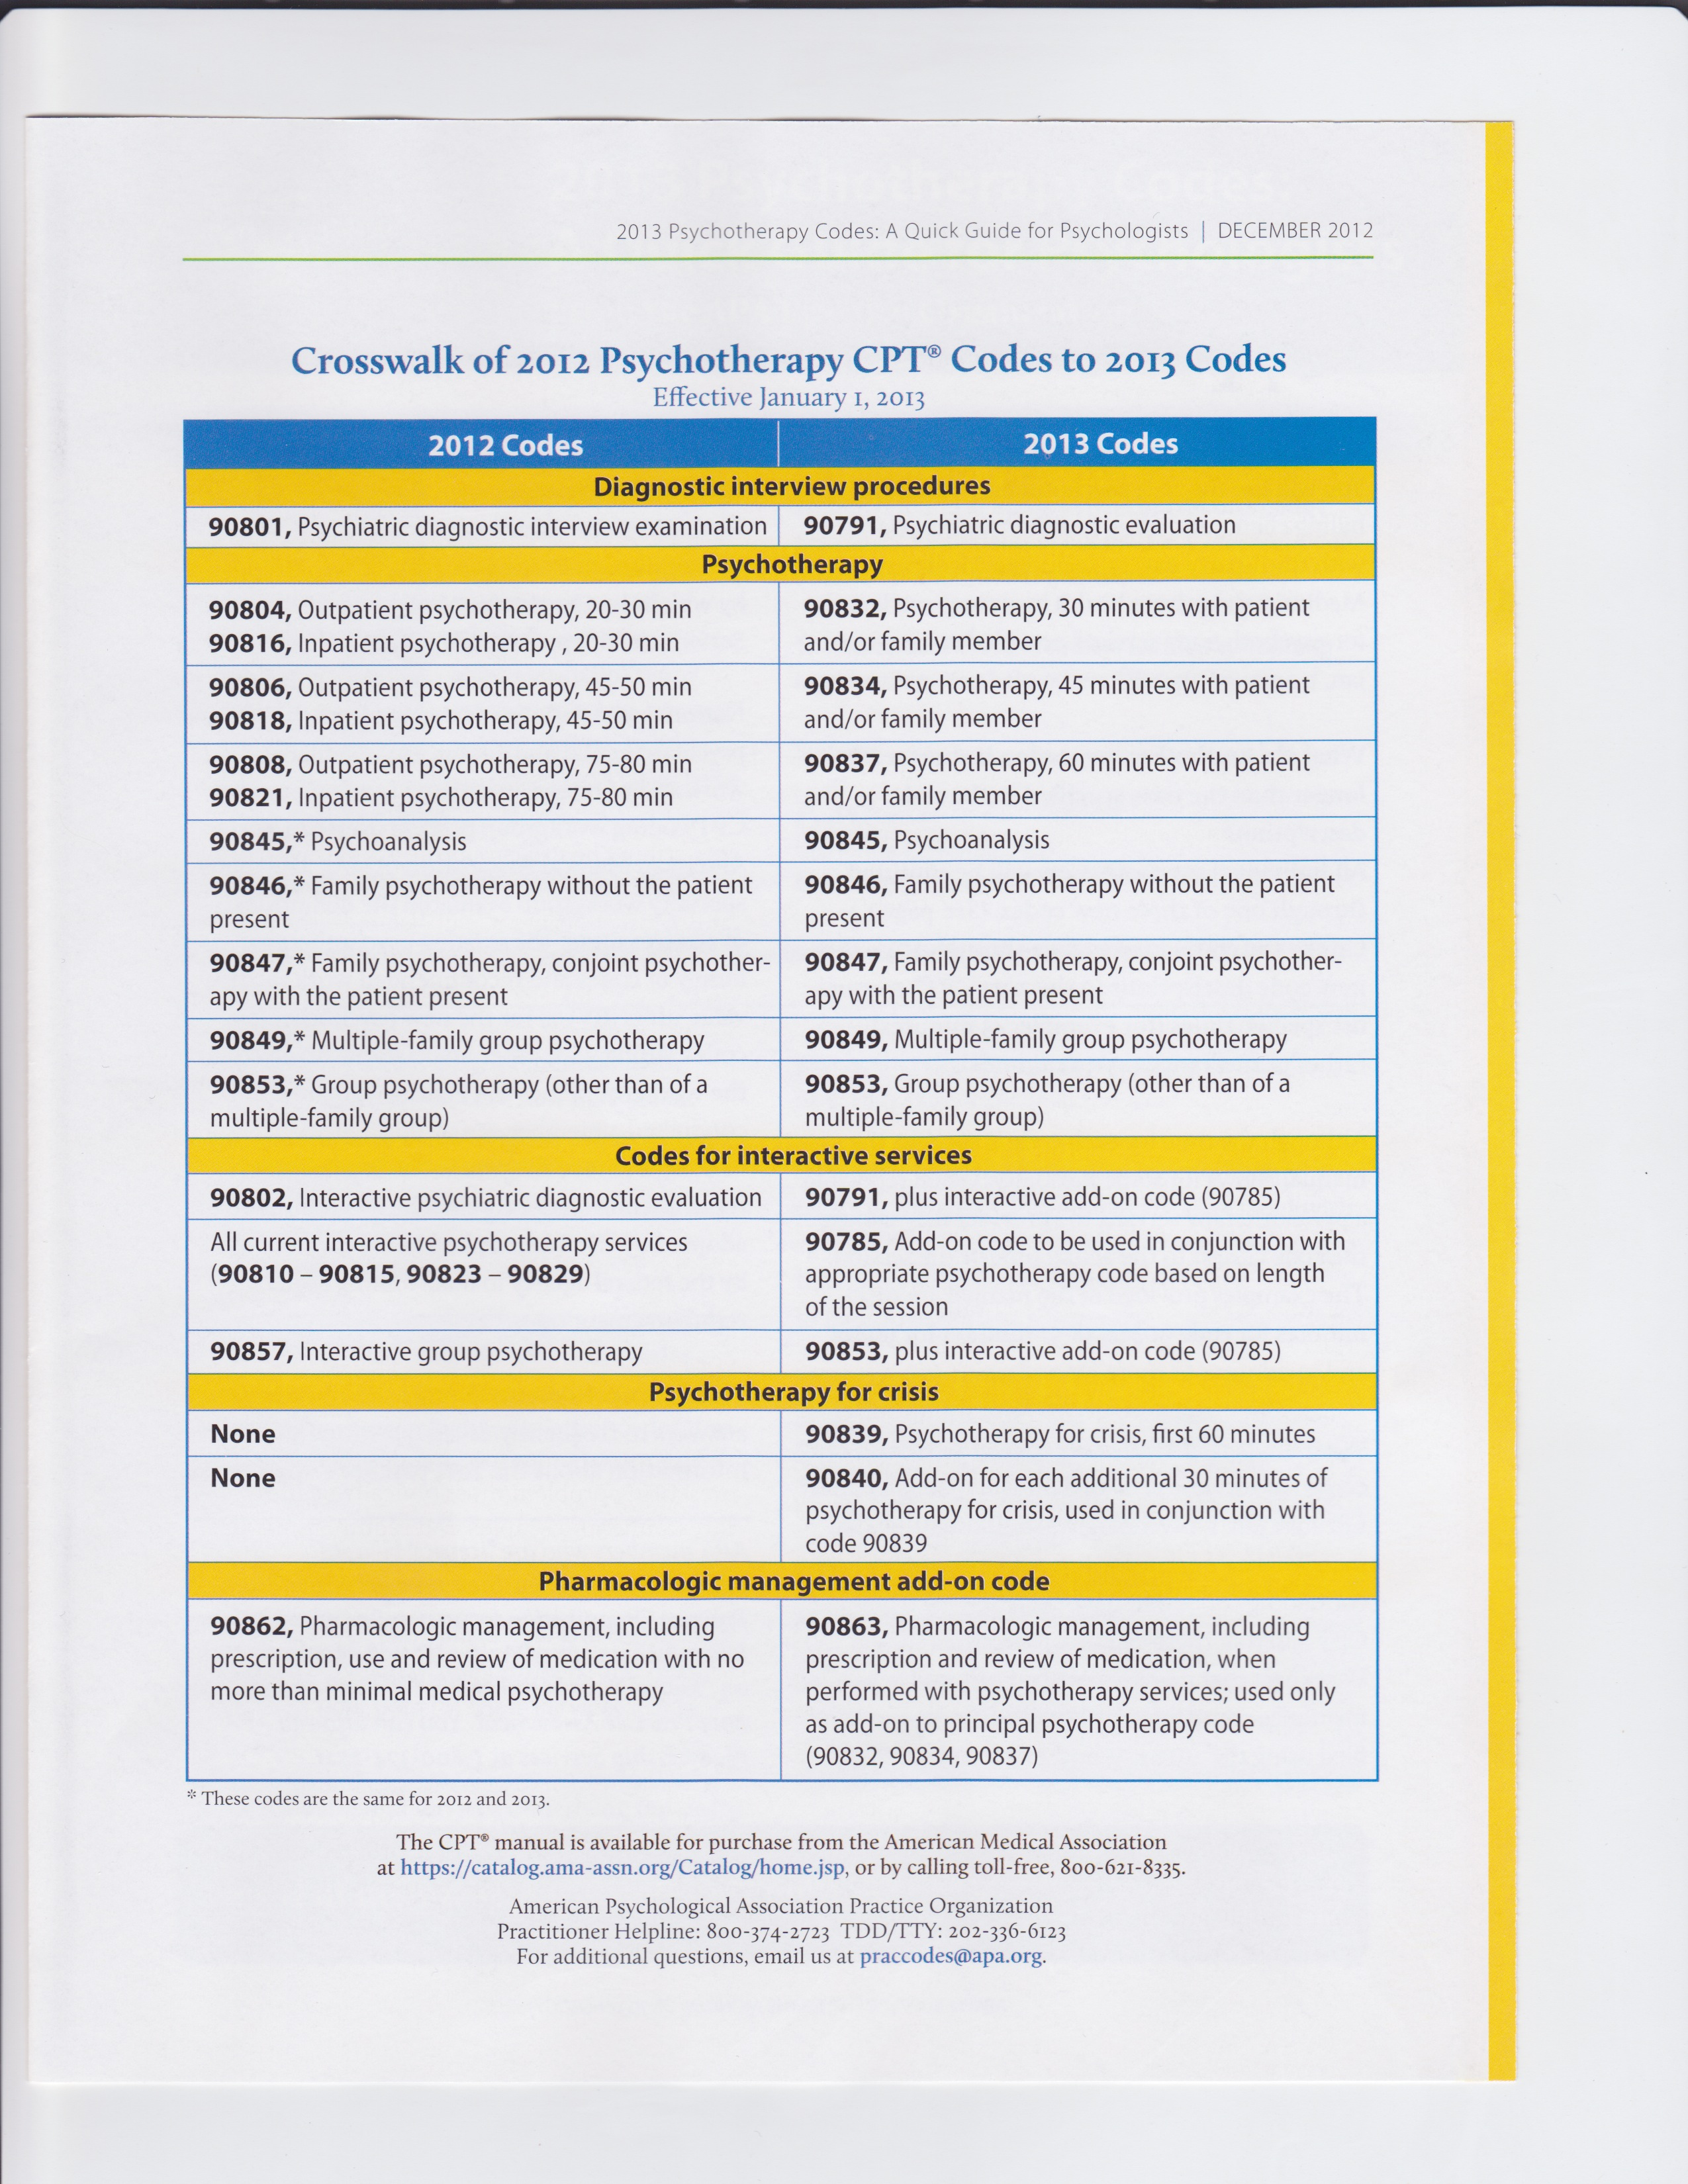 Cpt Codes2013 http://thepracticeinstitute.com/archives/6381/cpt-codes ...